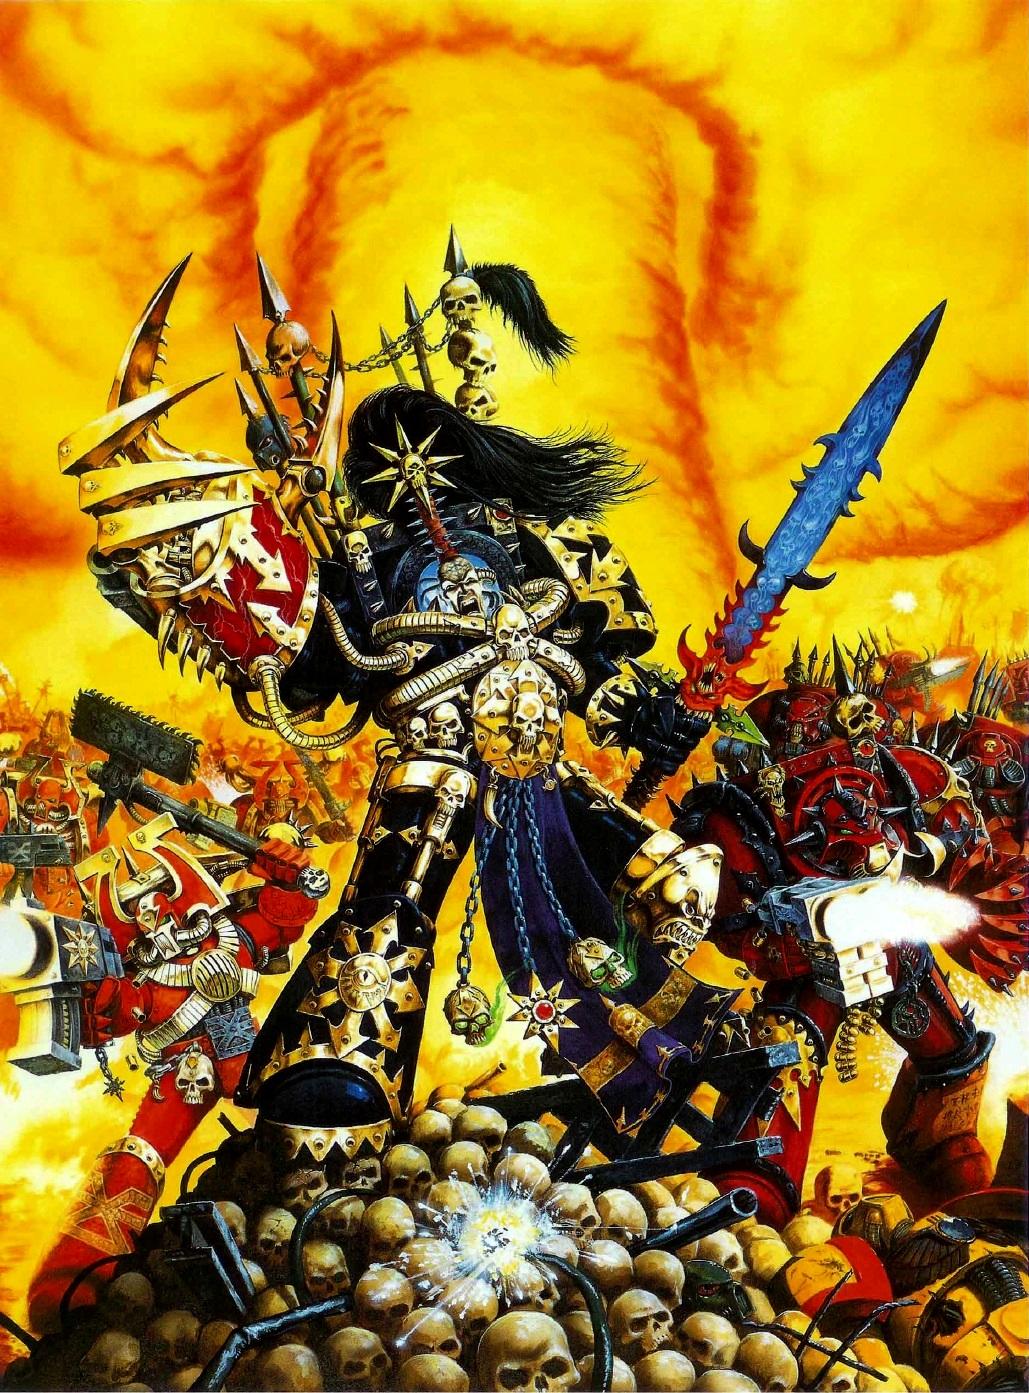 Codex_Chaos_Coverart